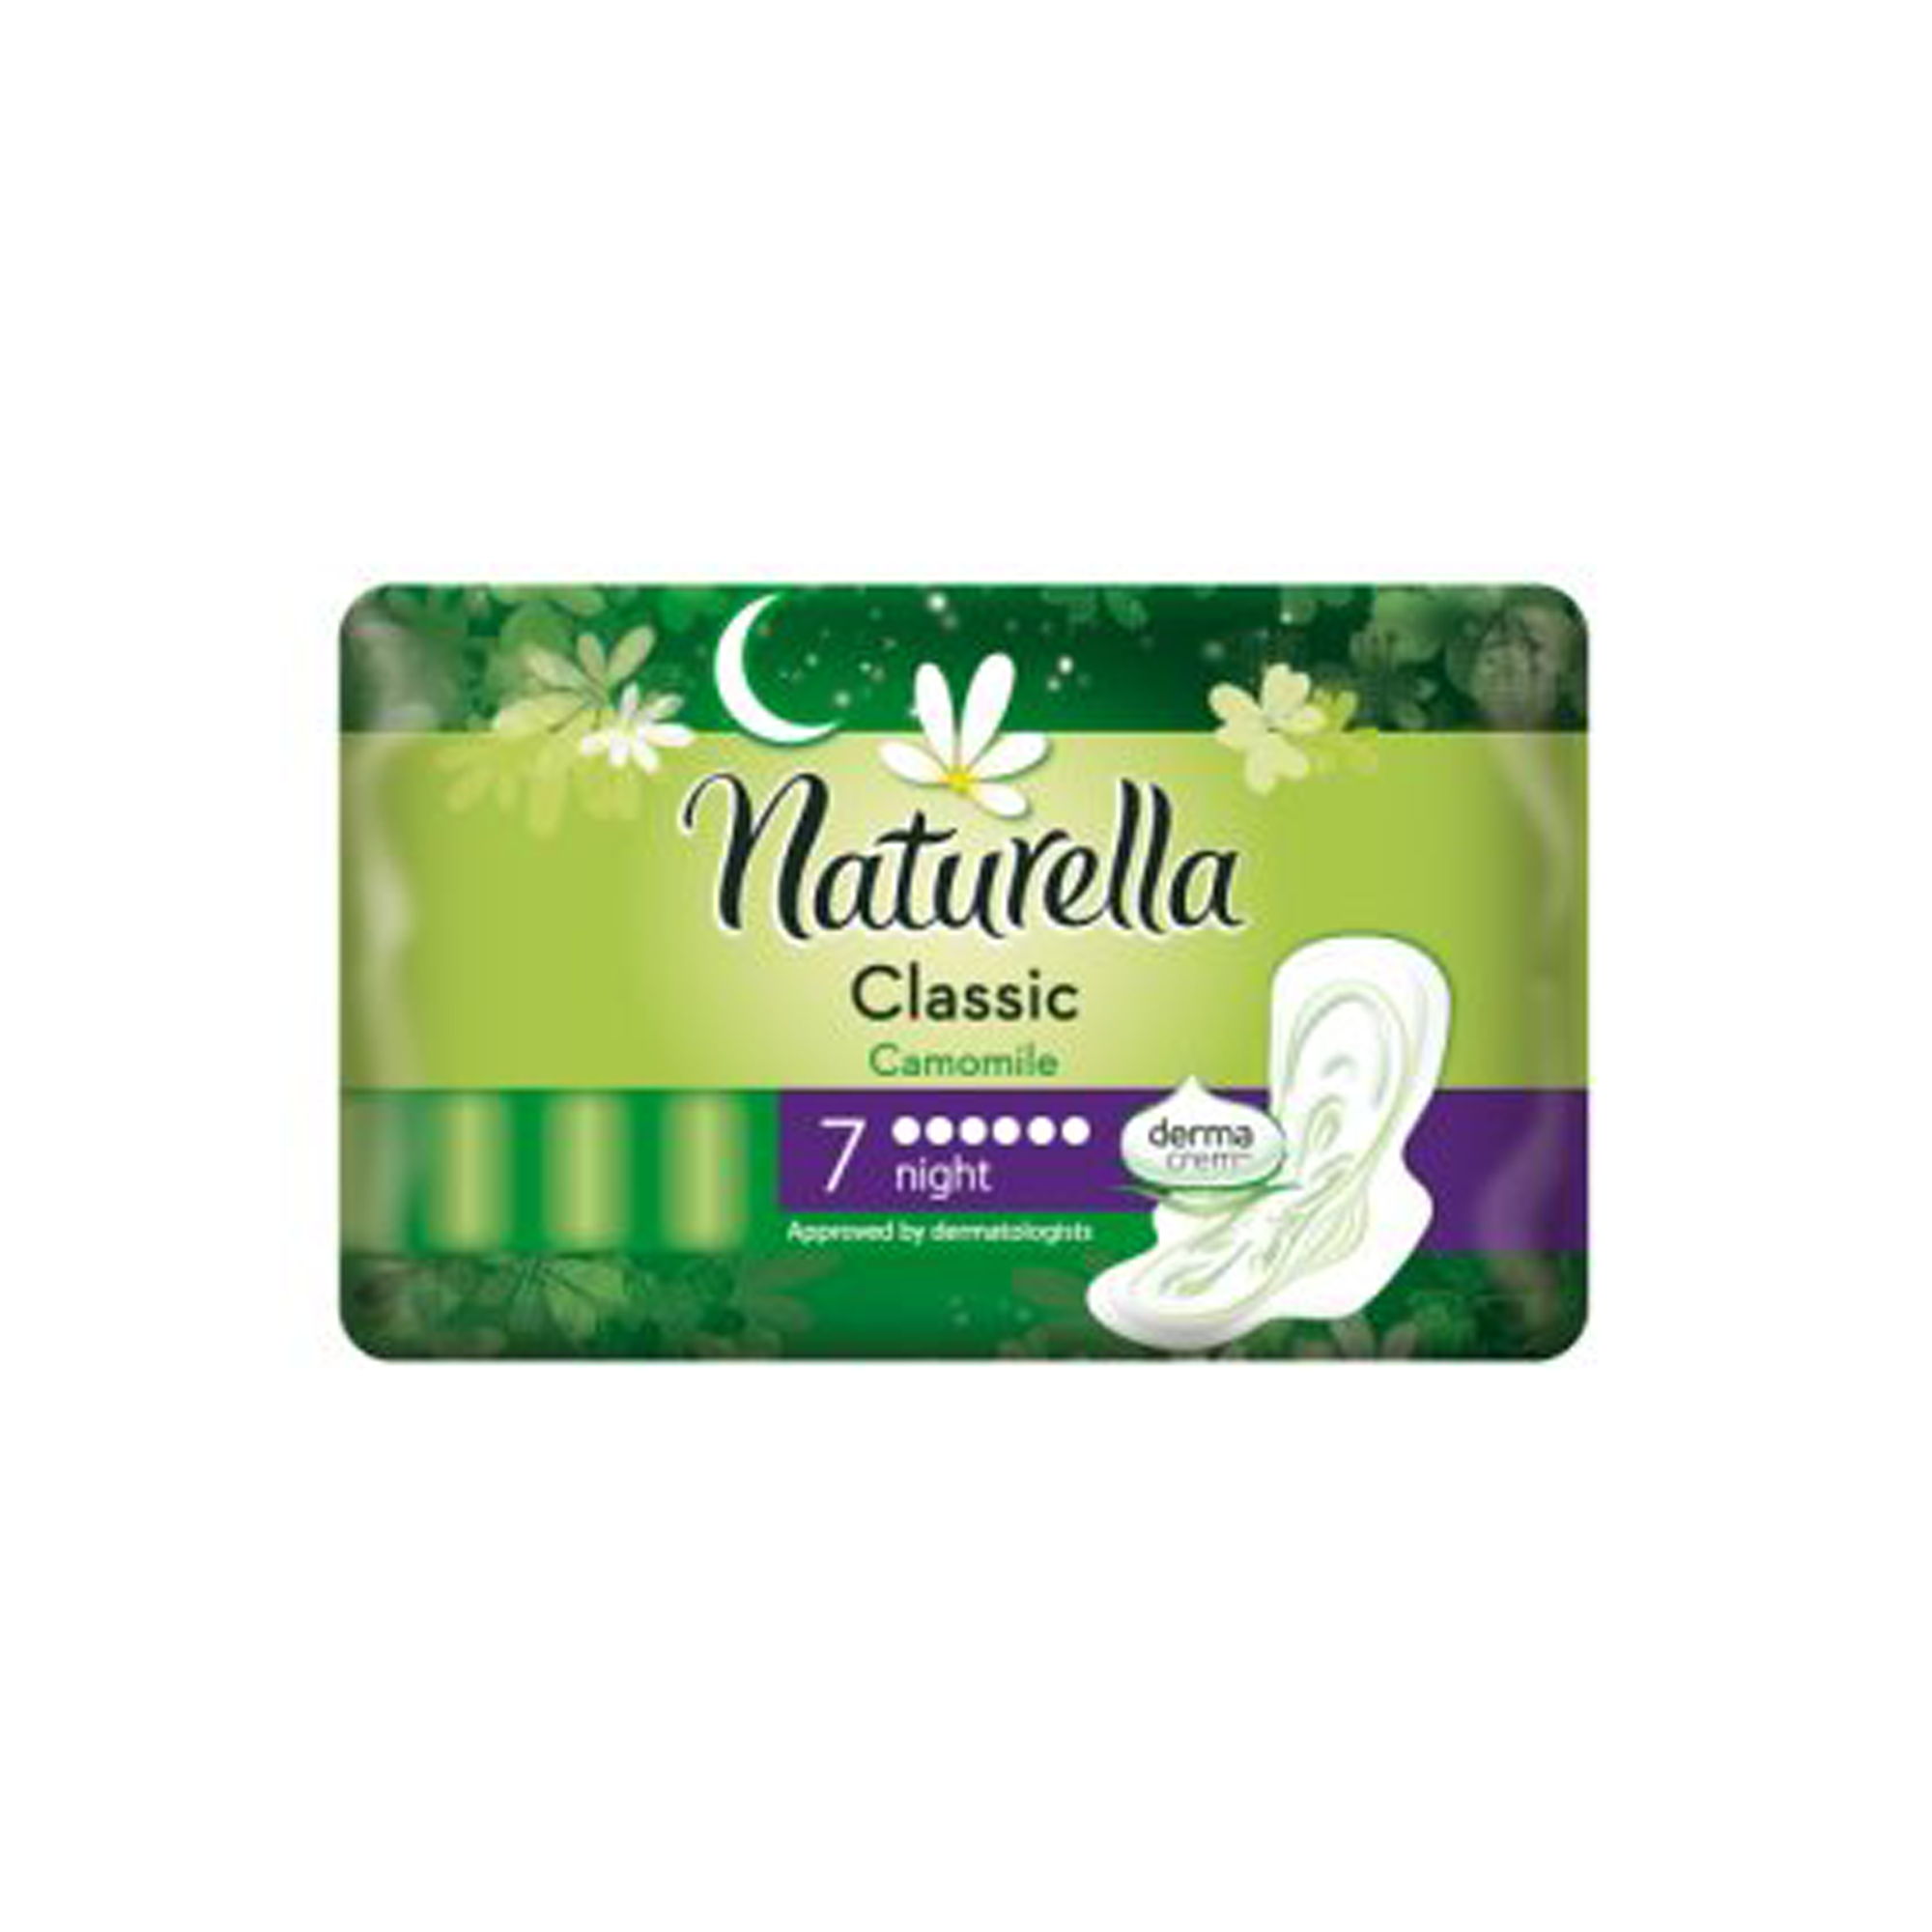 Image of Naturella Naturella Classic Maandverband - Night 7 stuks